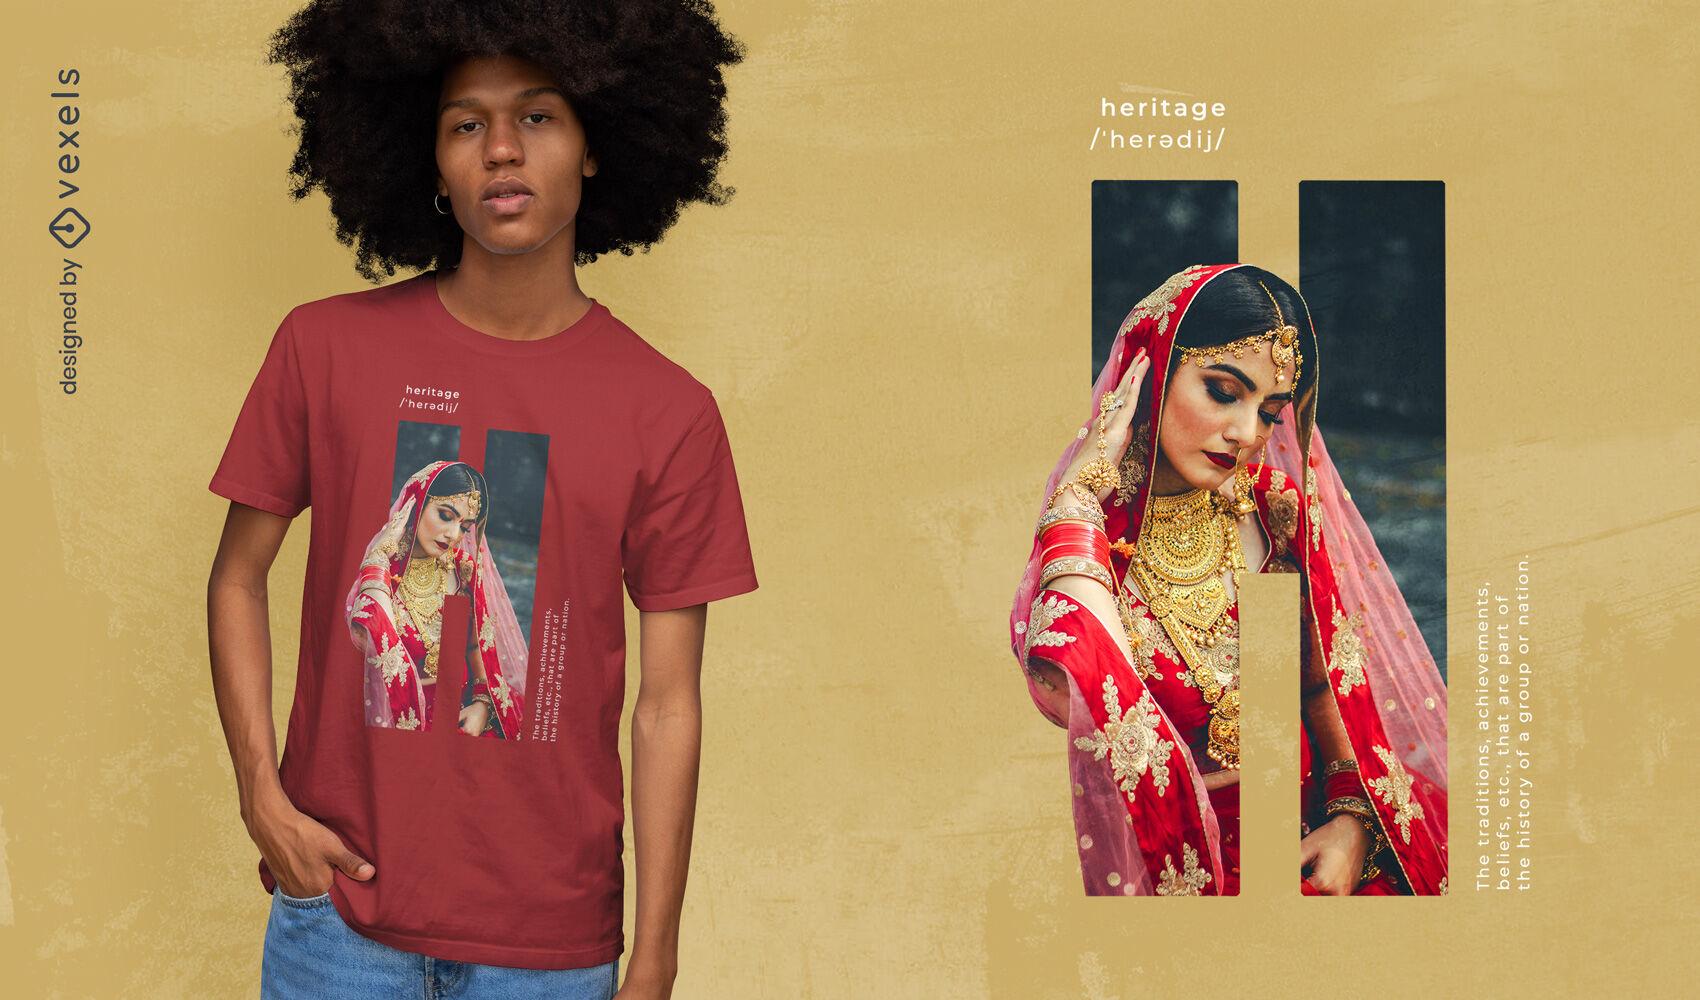 Heritage ethnic culture girl psd t-shirt design